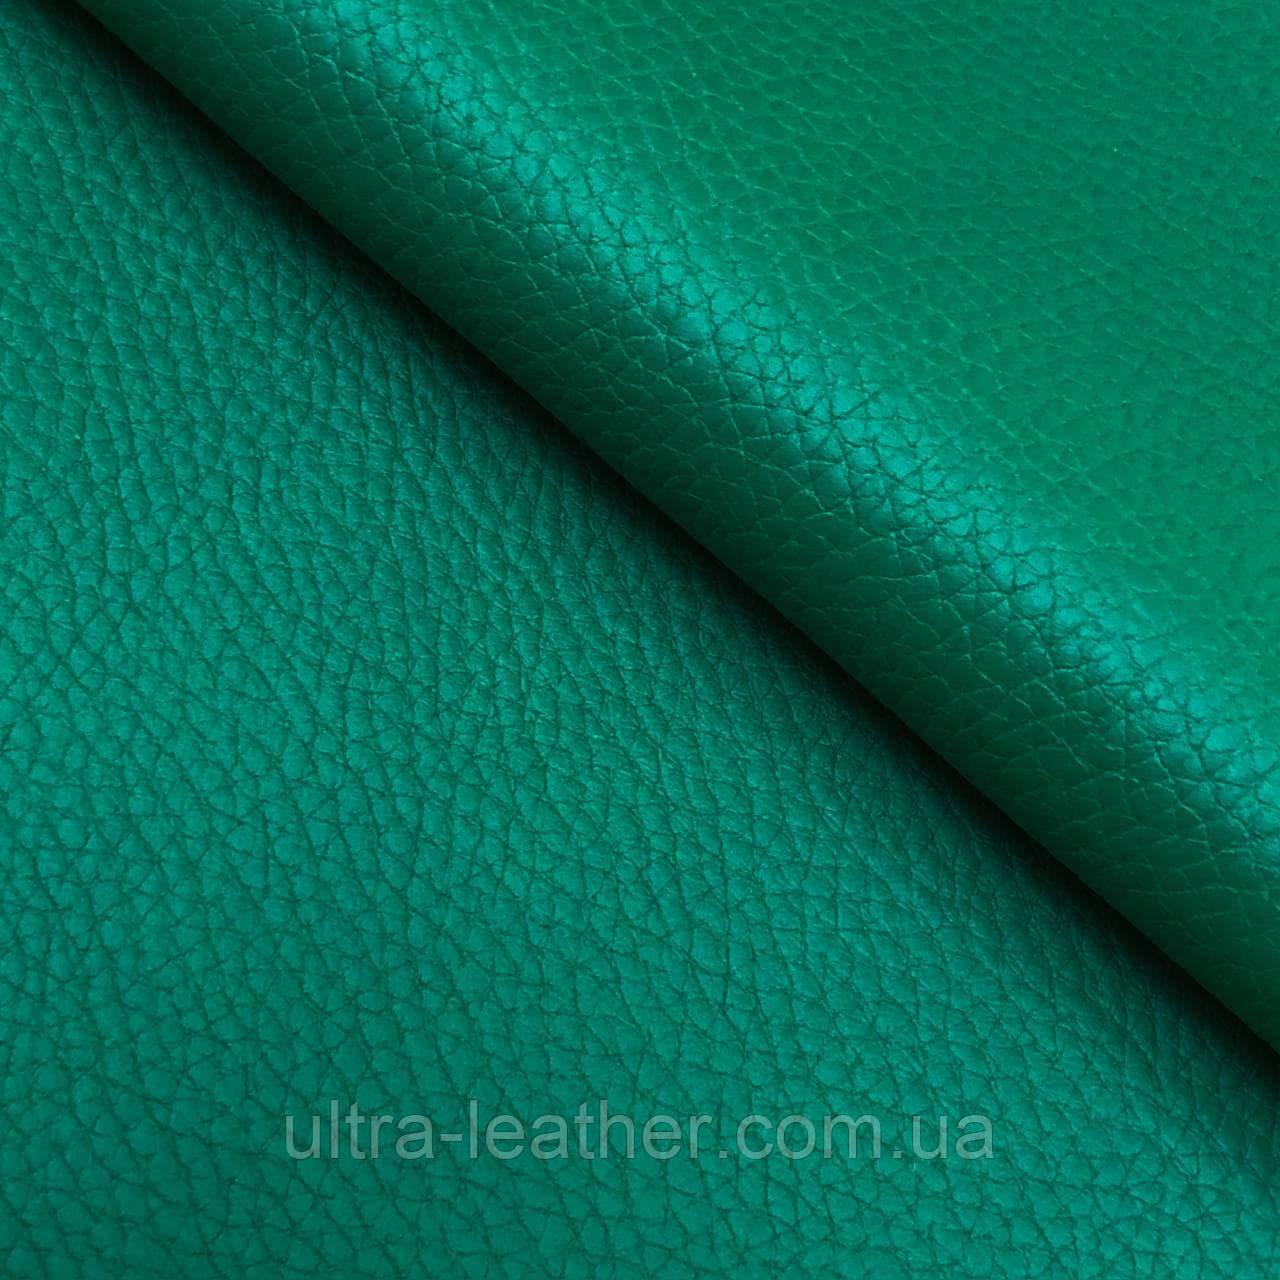 Натуральная галантерейная кожа  ФЛЕШ, Зеленый, Pantone 18-6030